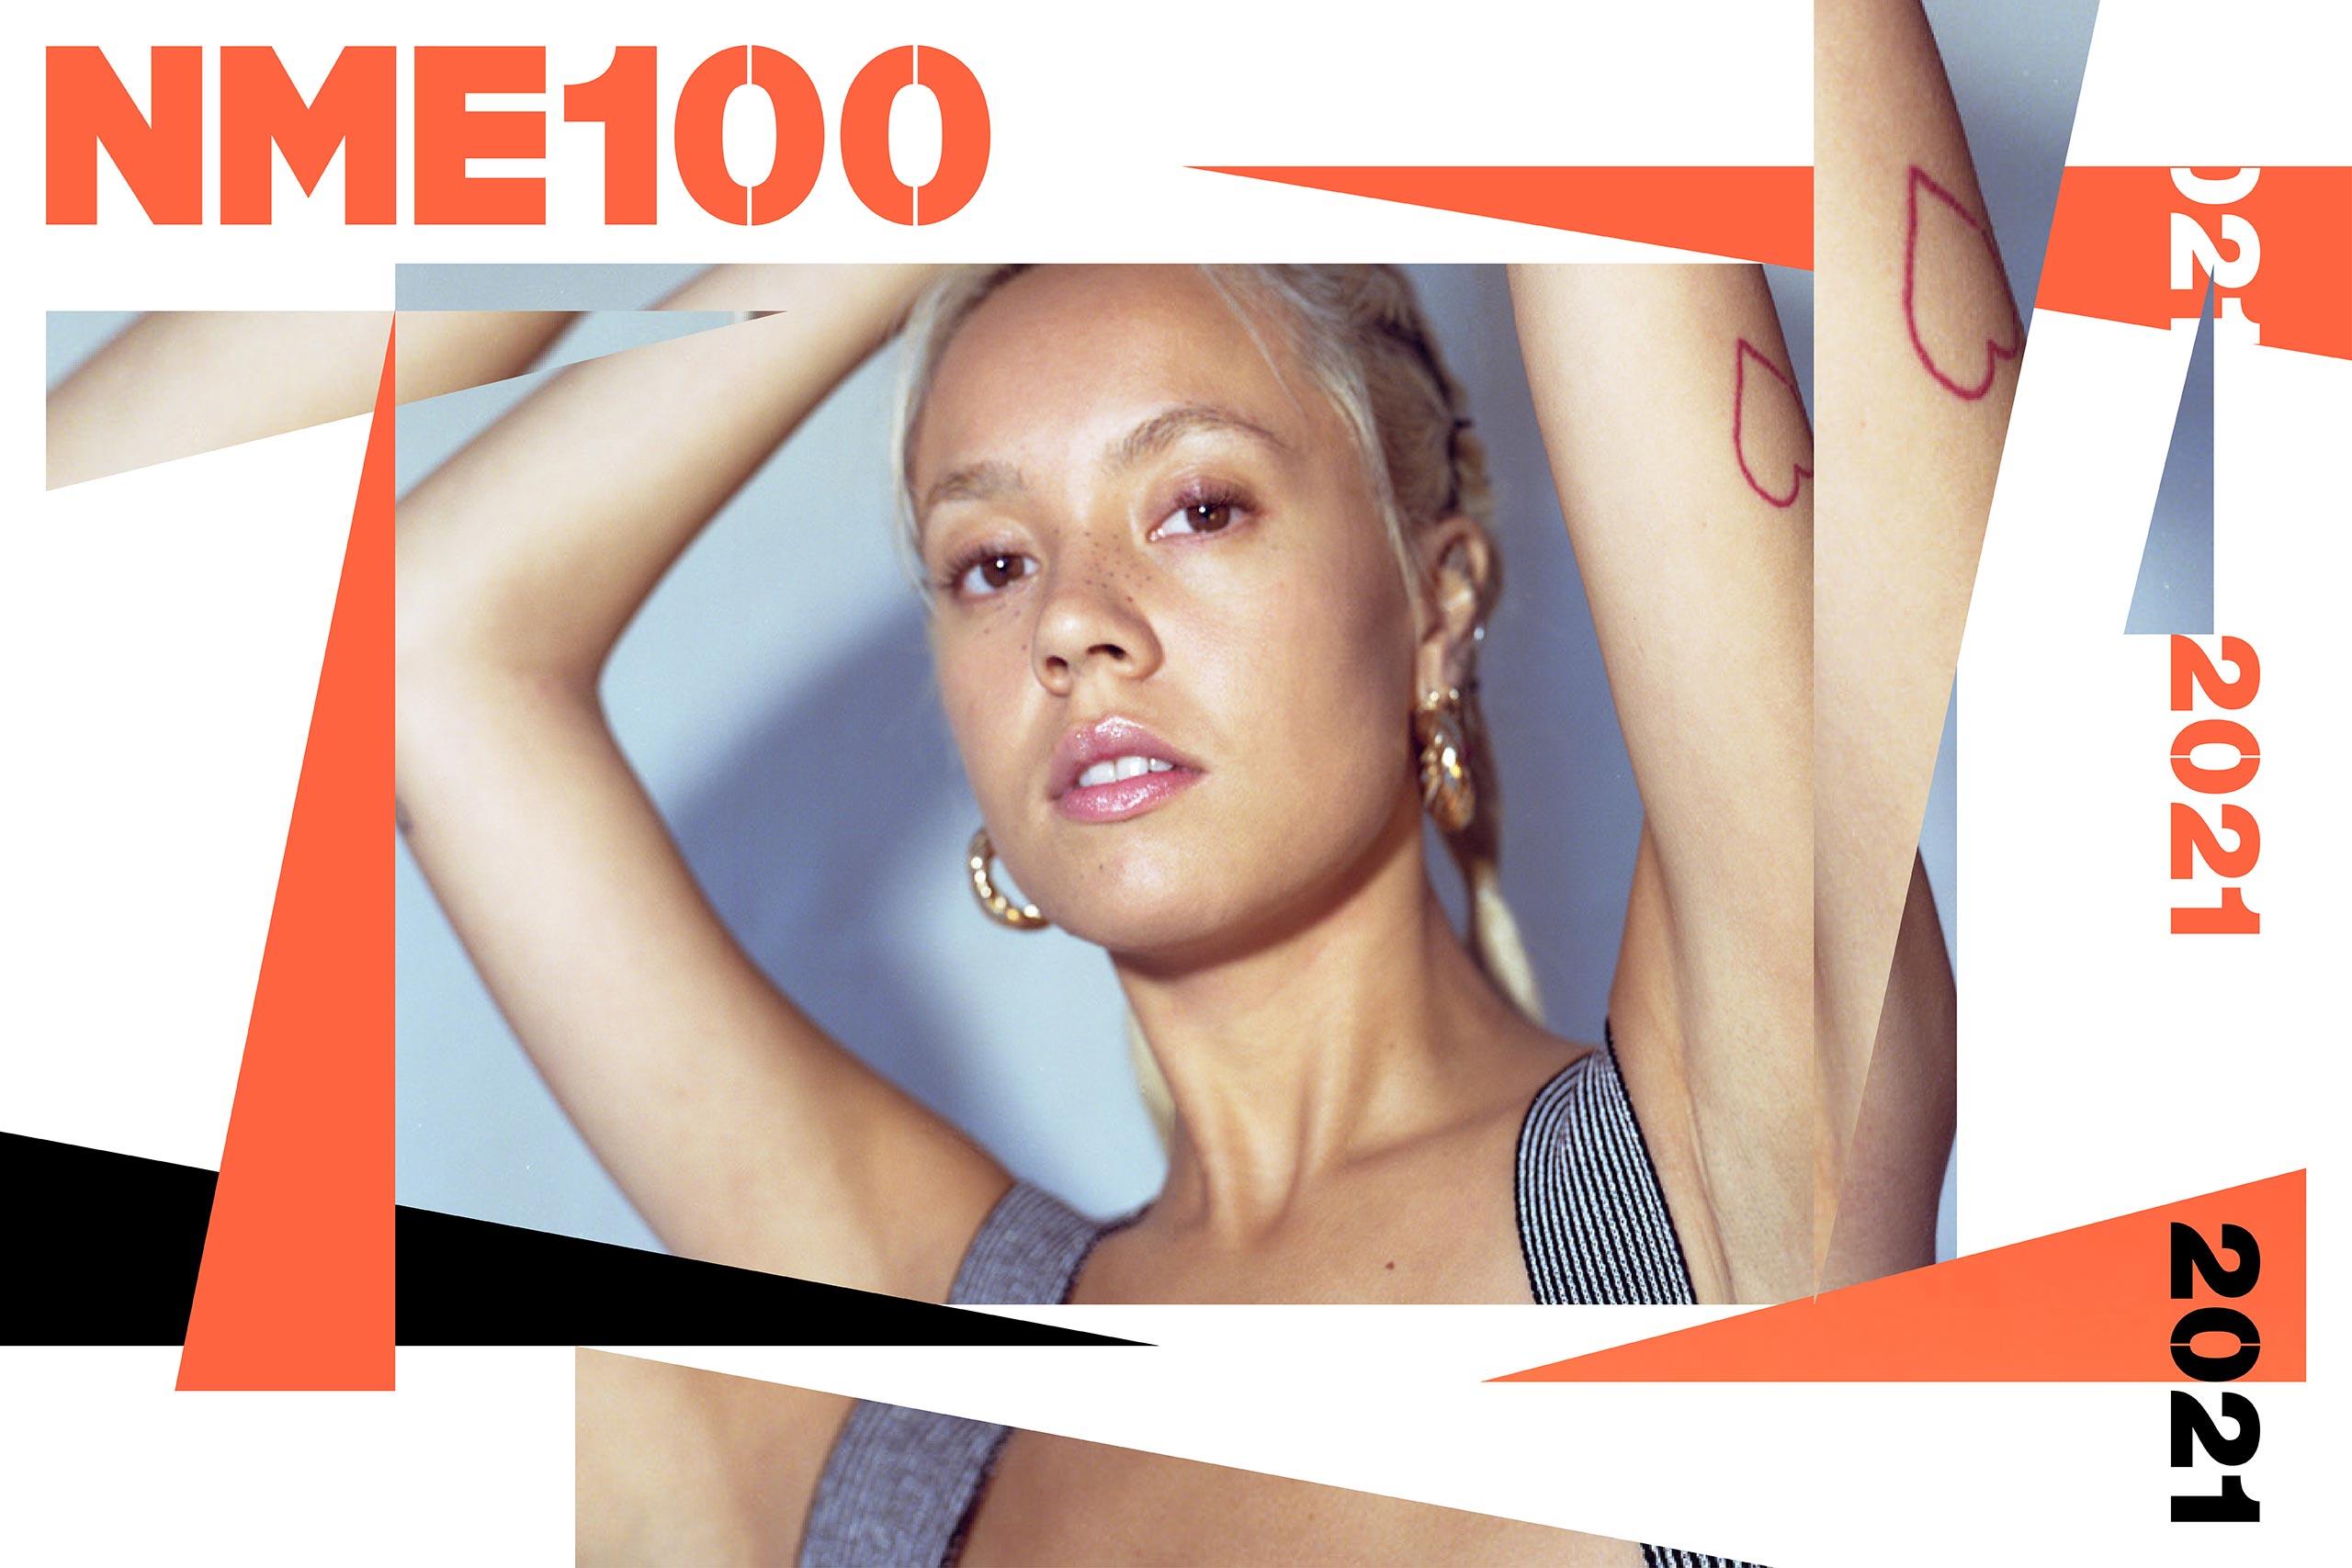 NME 100 josie man